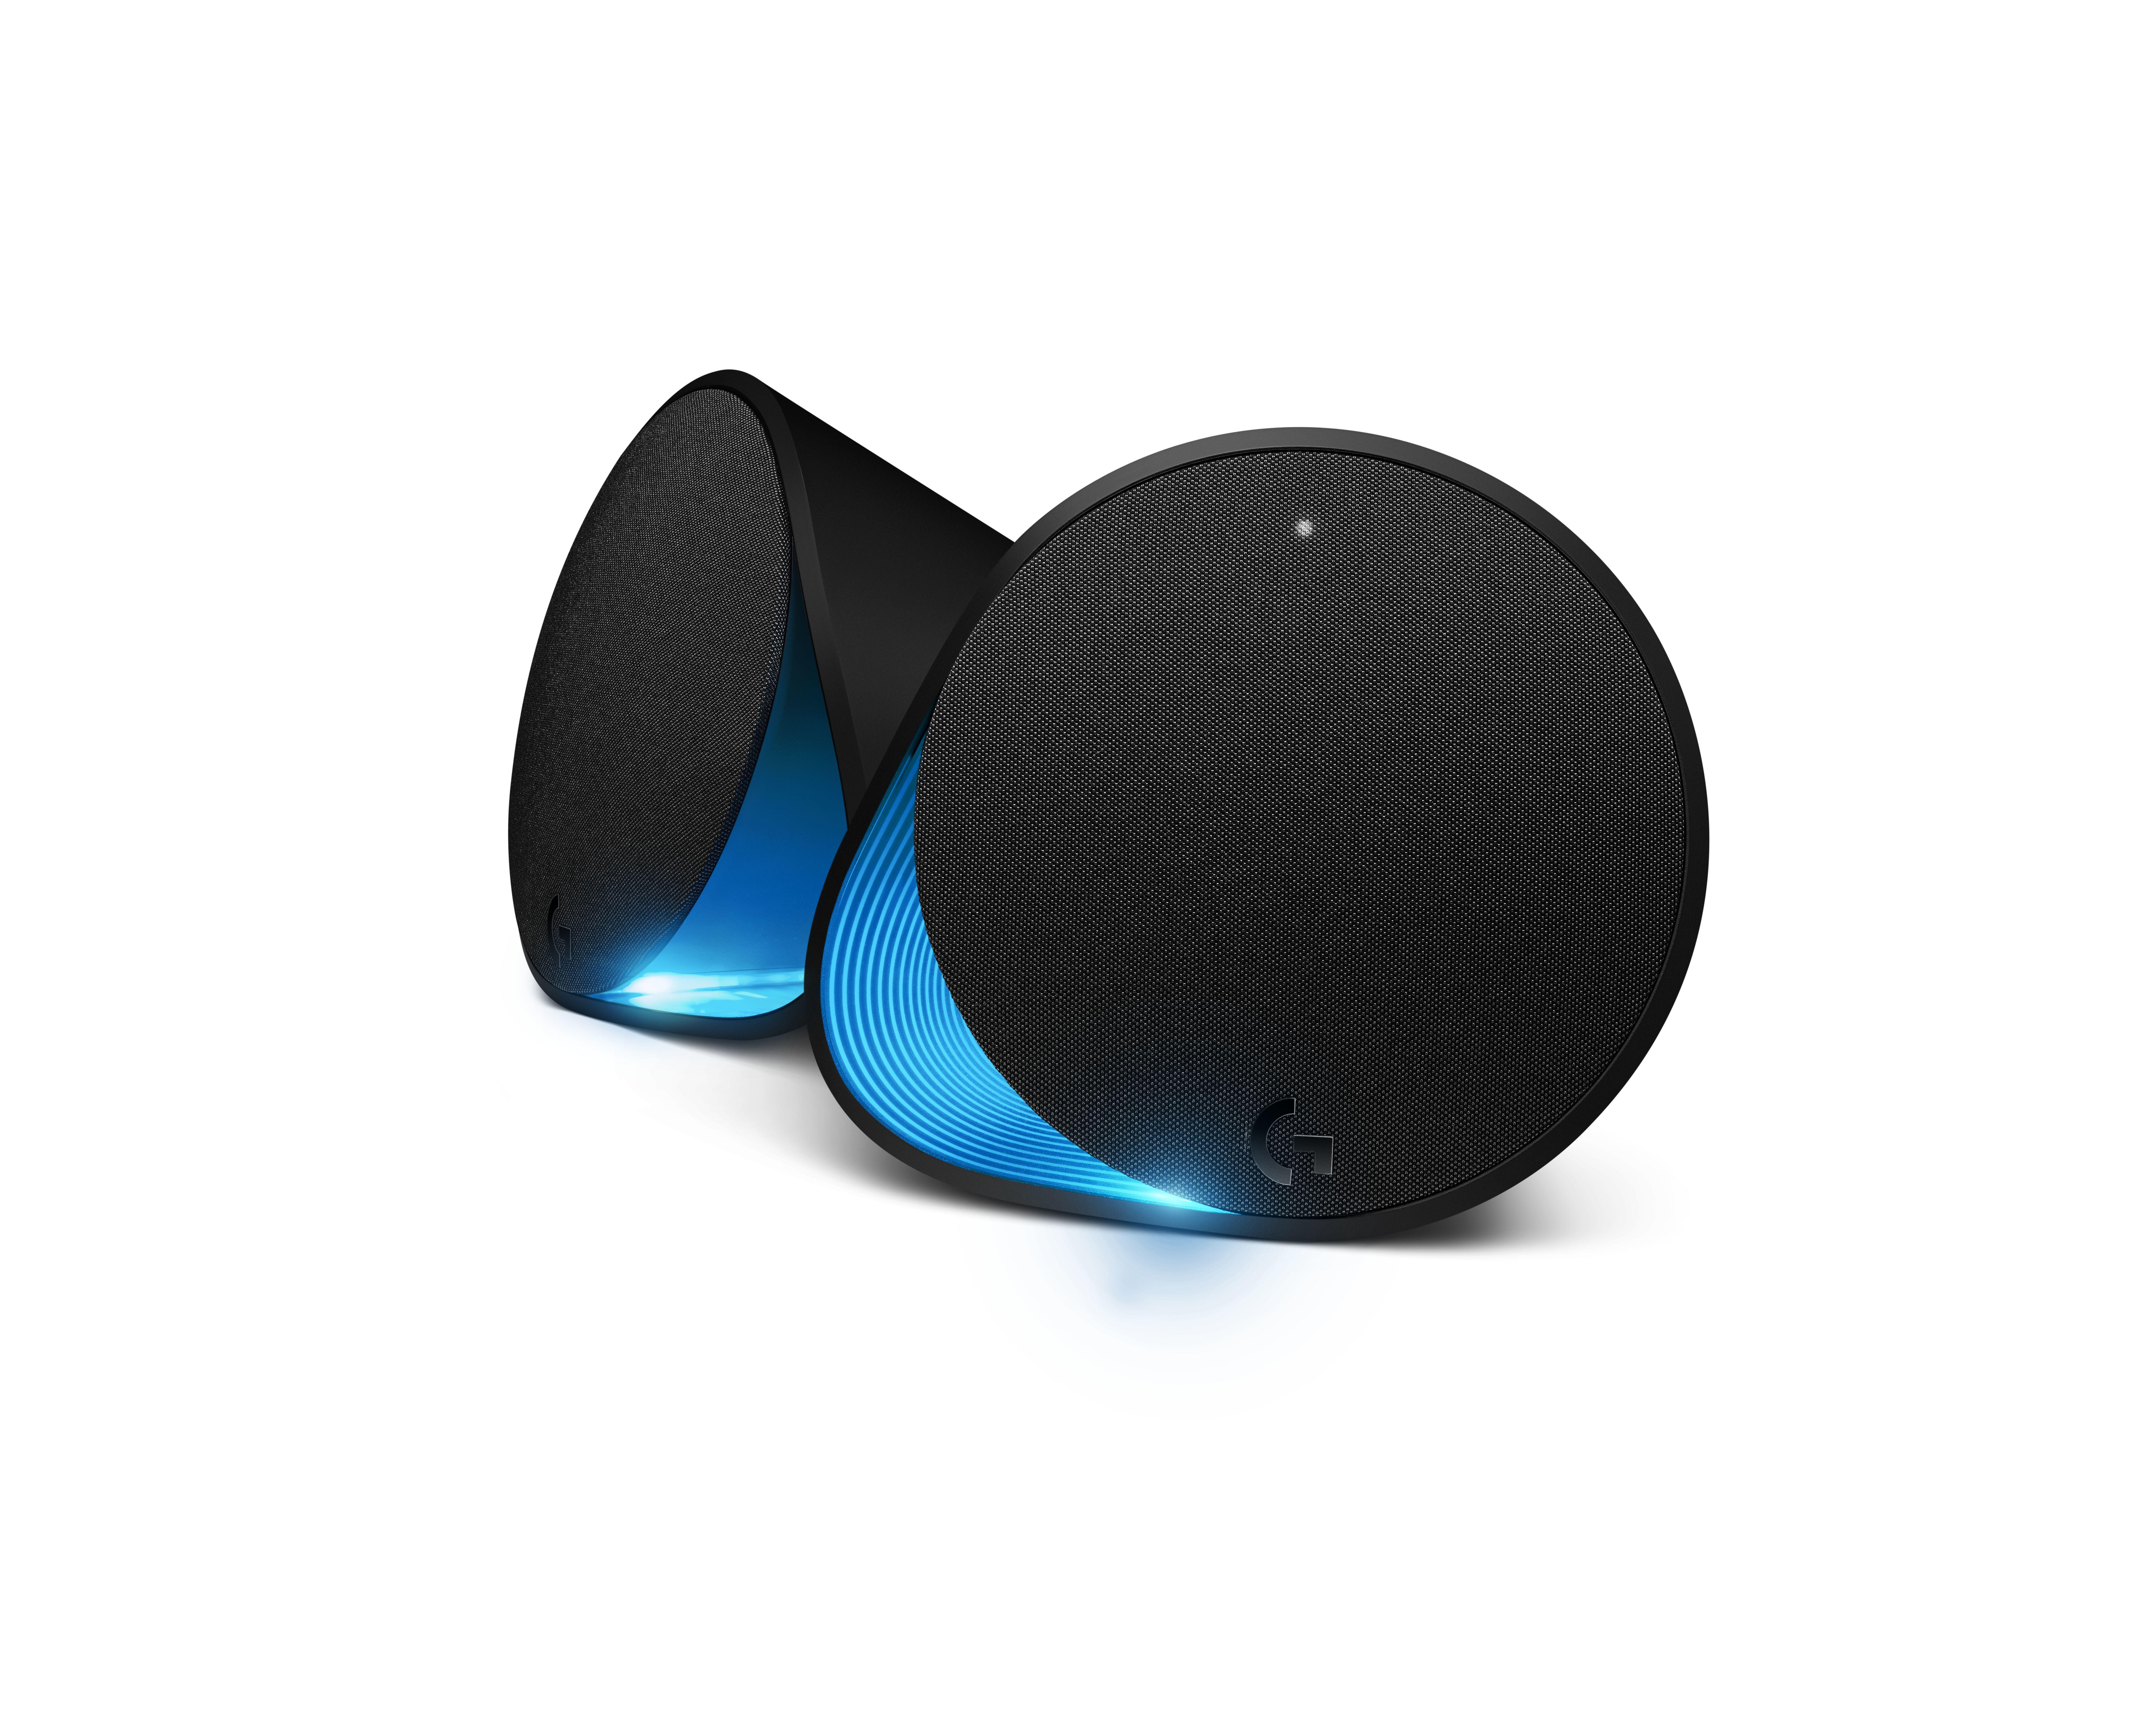 G560 Lightsync PC Speakers Gaming